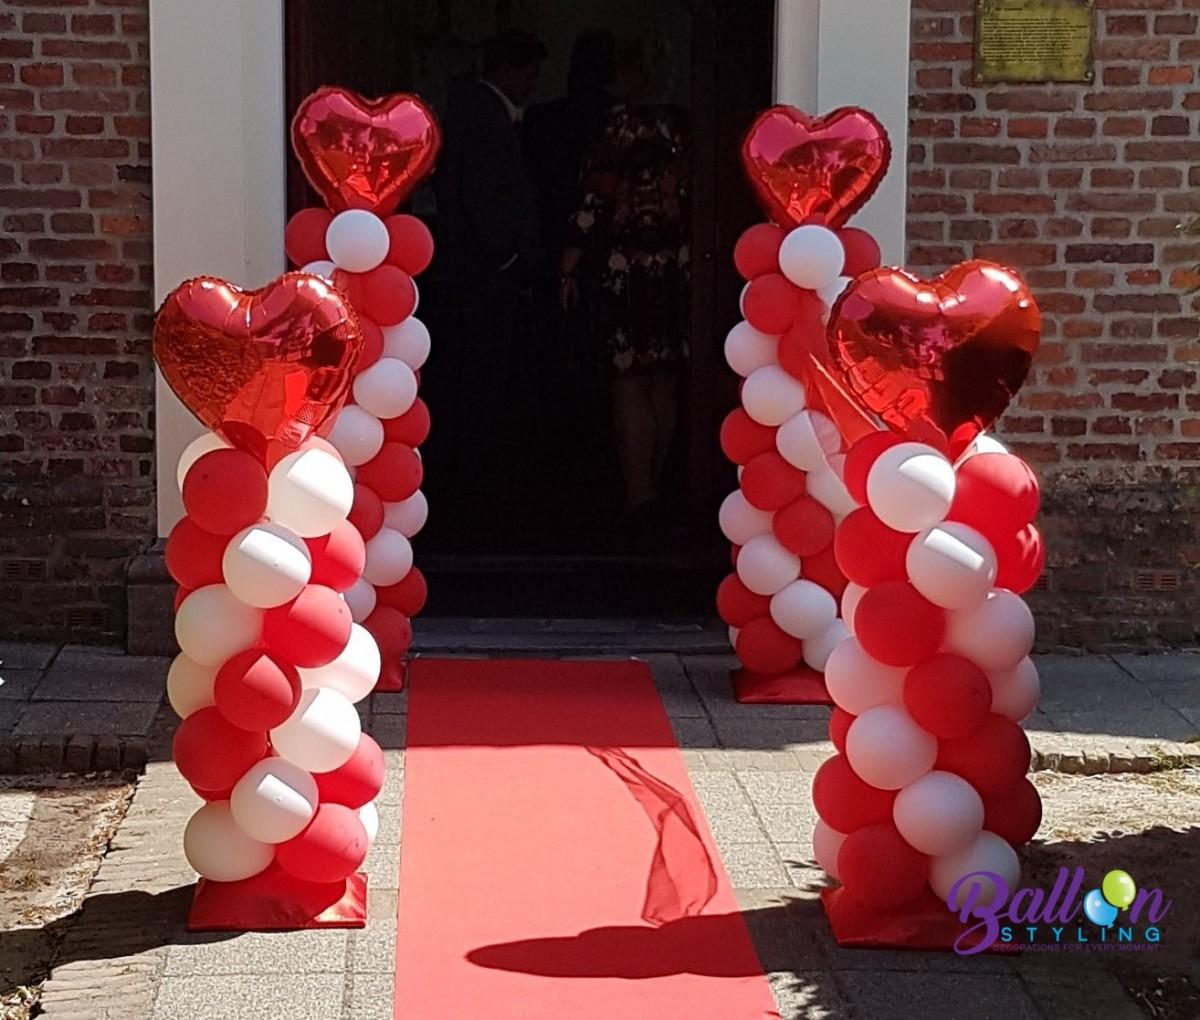 Balloon Styling Tilburg ballonnenpilaar ballonpilaar huwelijk trouwerij minipilaren folie hartballon